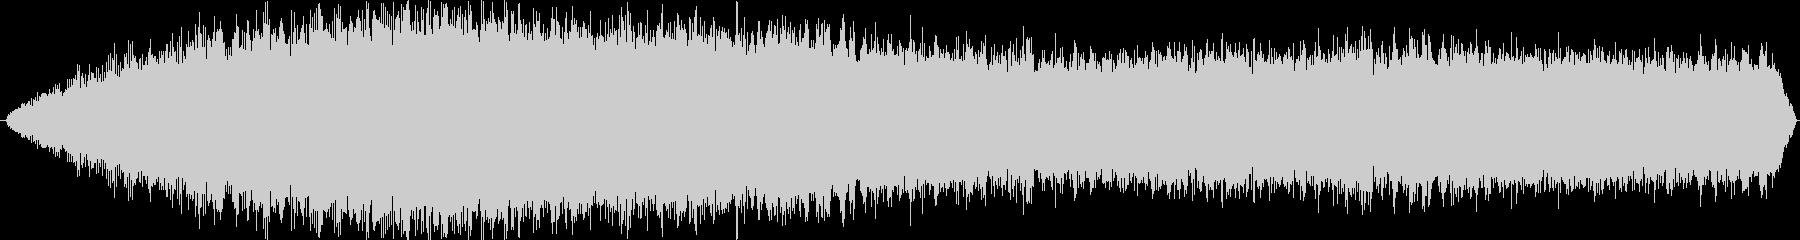 PADS カテドラルエア01の未再生の波形